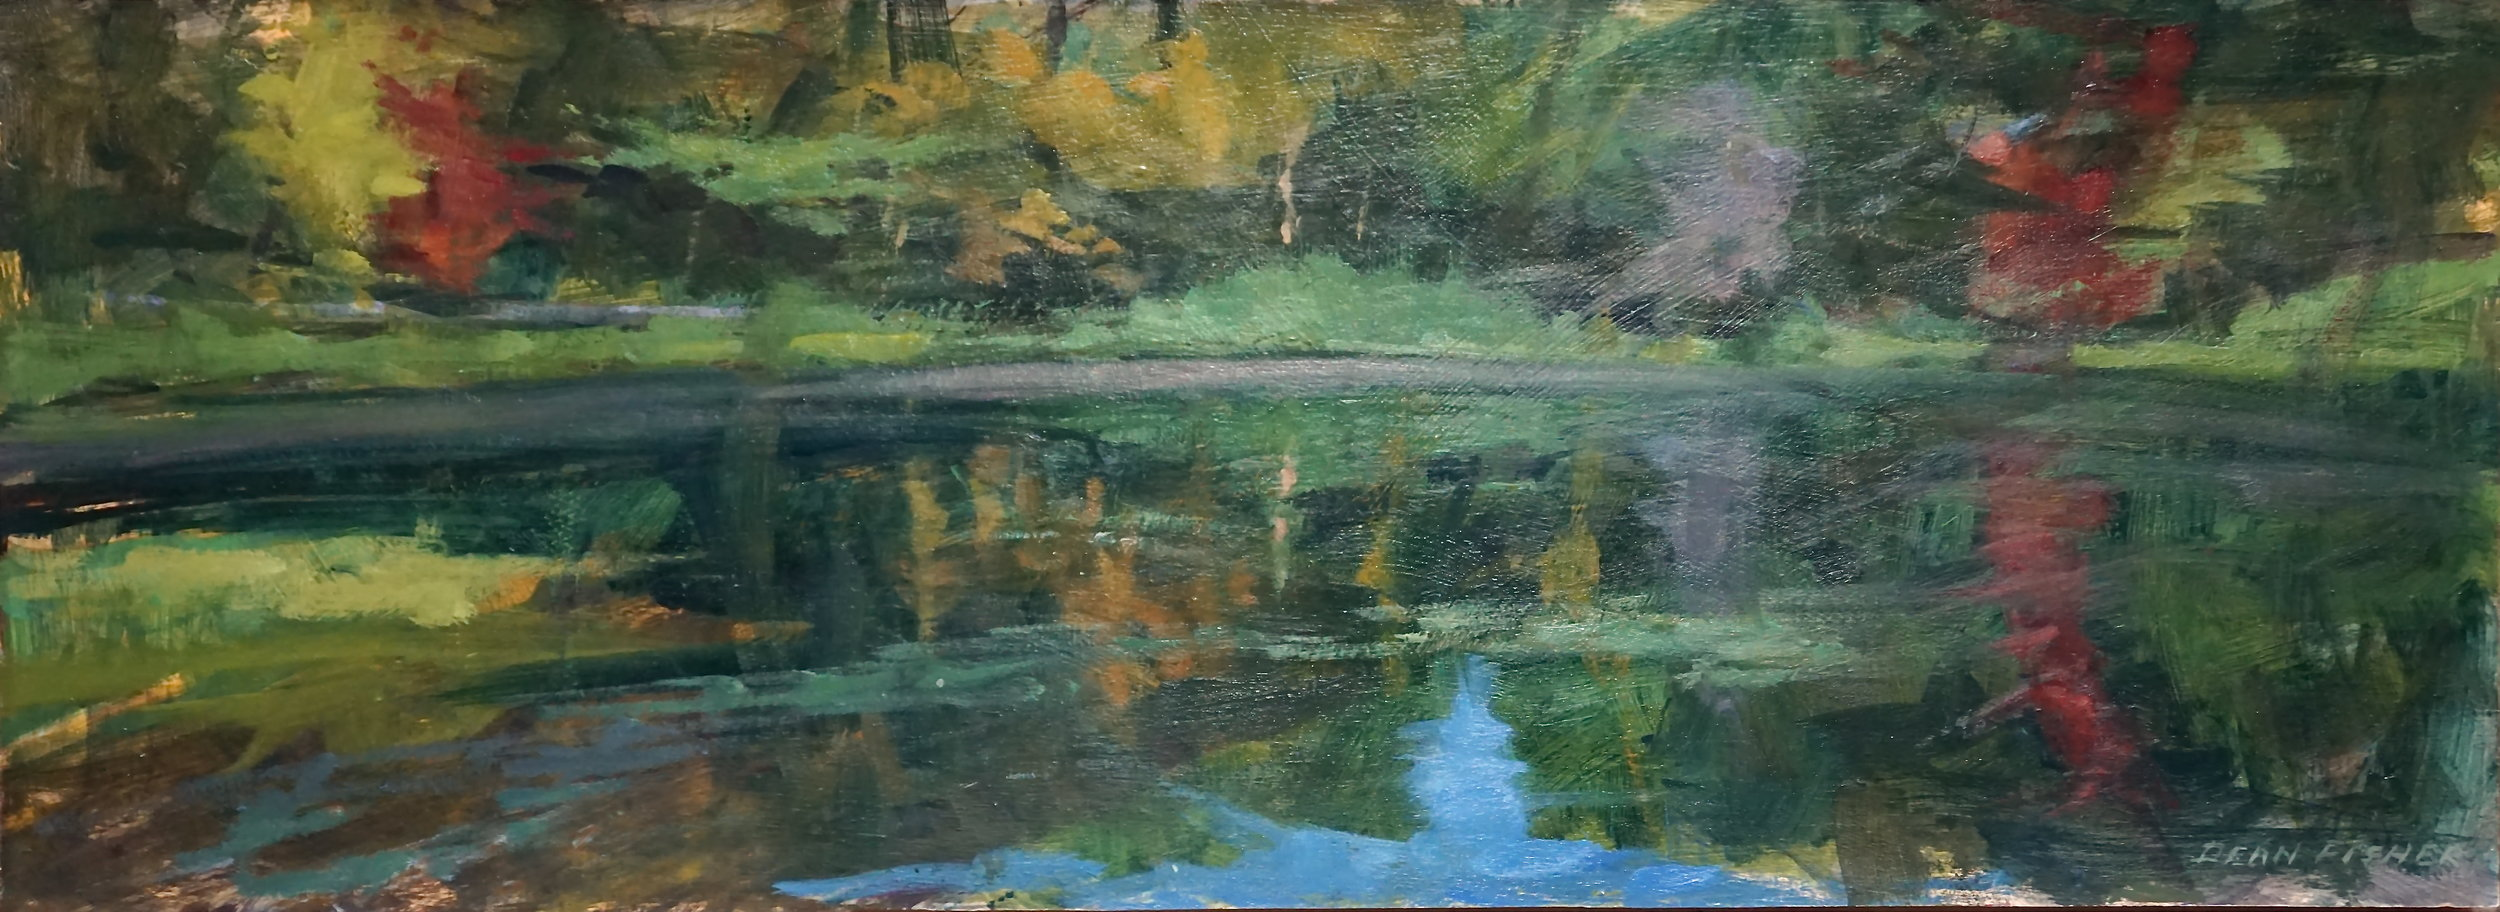 Summer Pond III